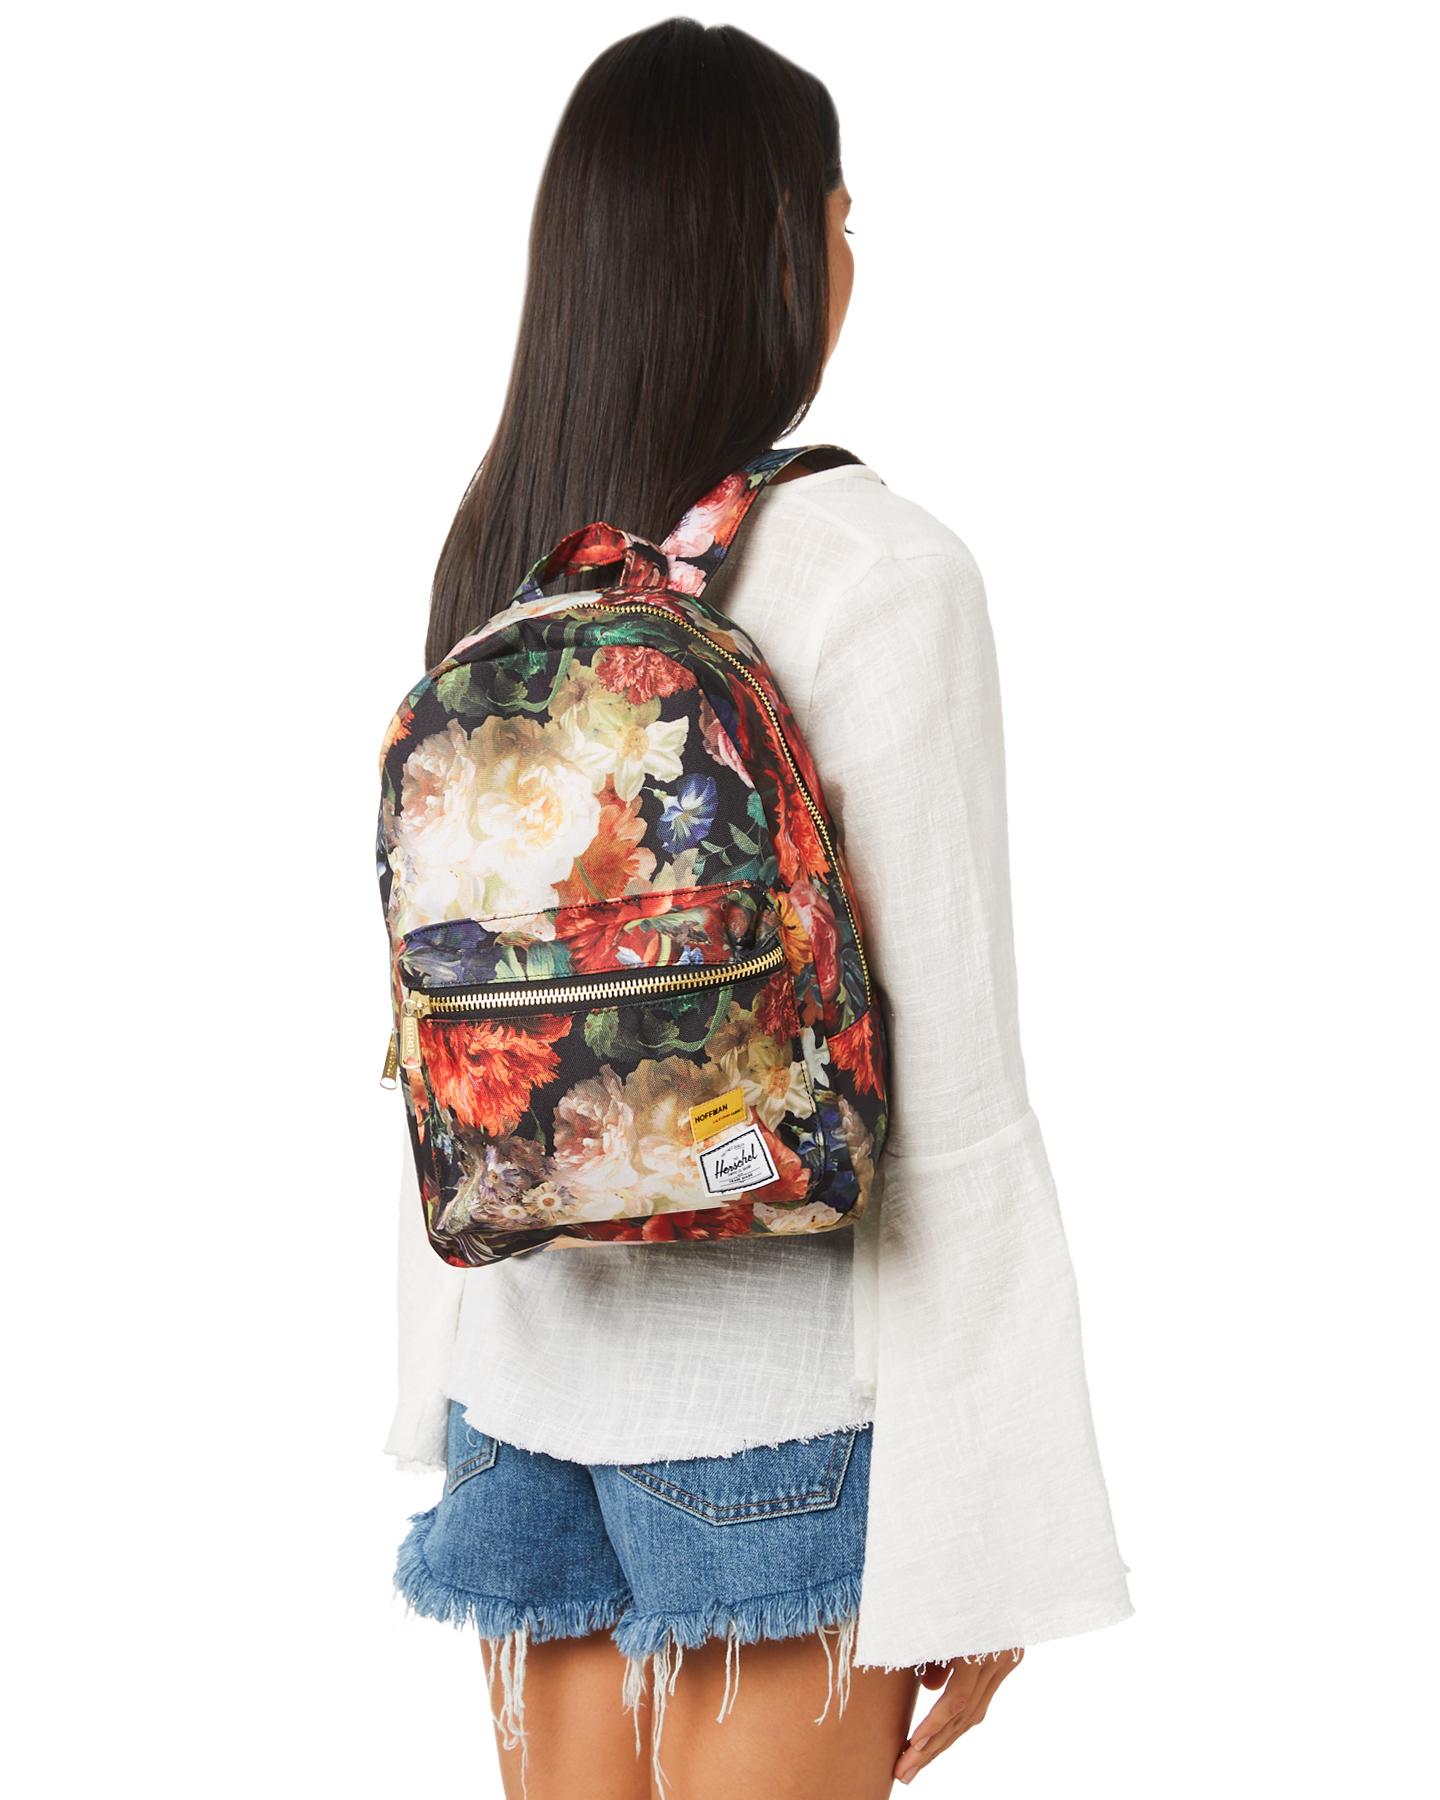 561d6c8ebf1 New Herschel Supply Co Women s Hoffman Grove X Small Backpack Fall Floral  N A